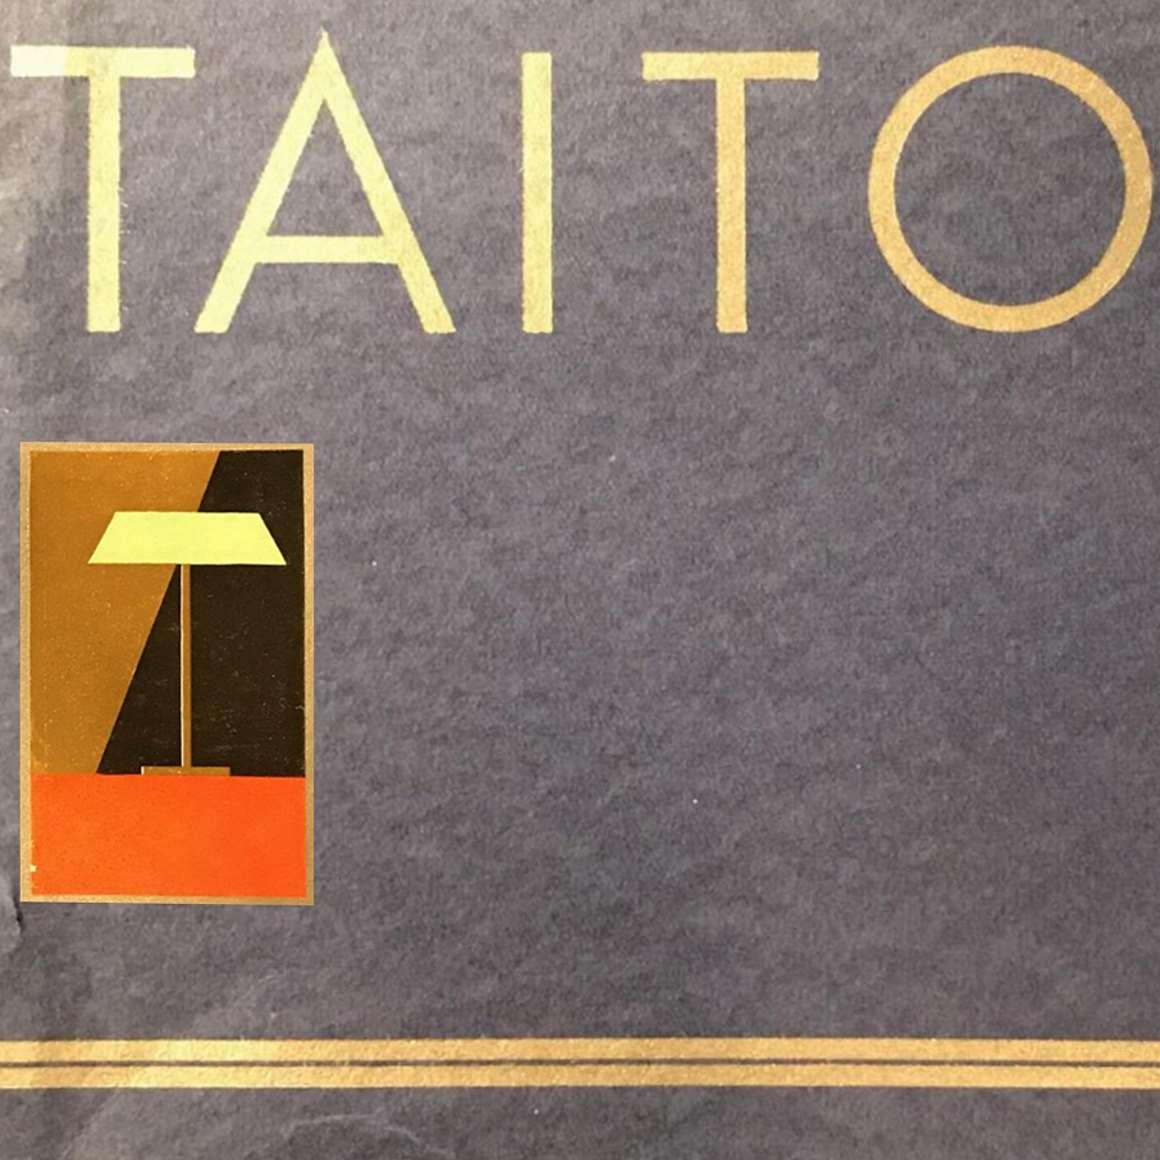 Taito Lighting Catalogue 1930s